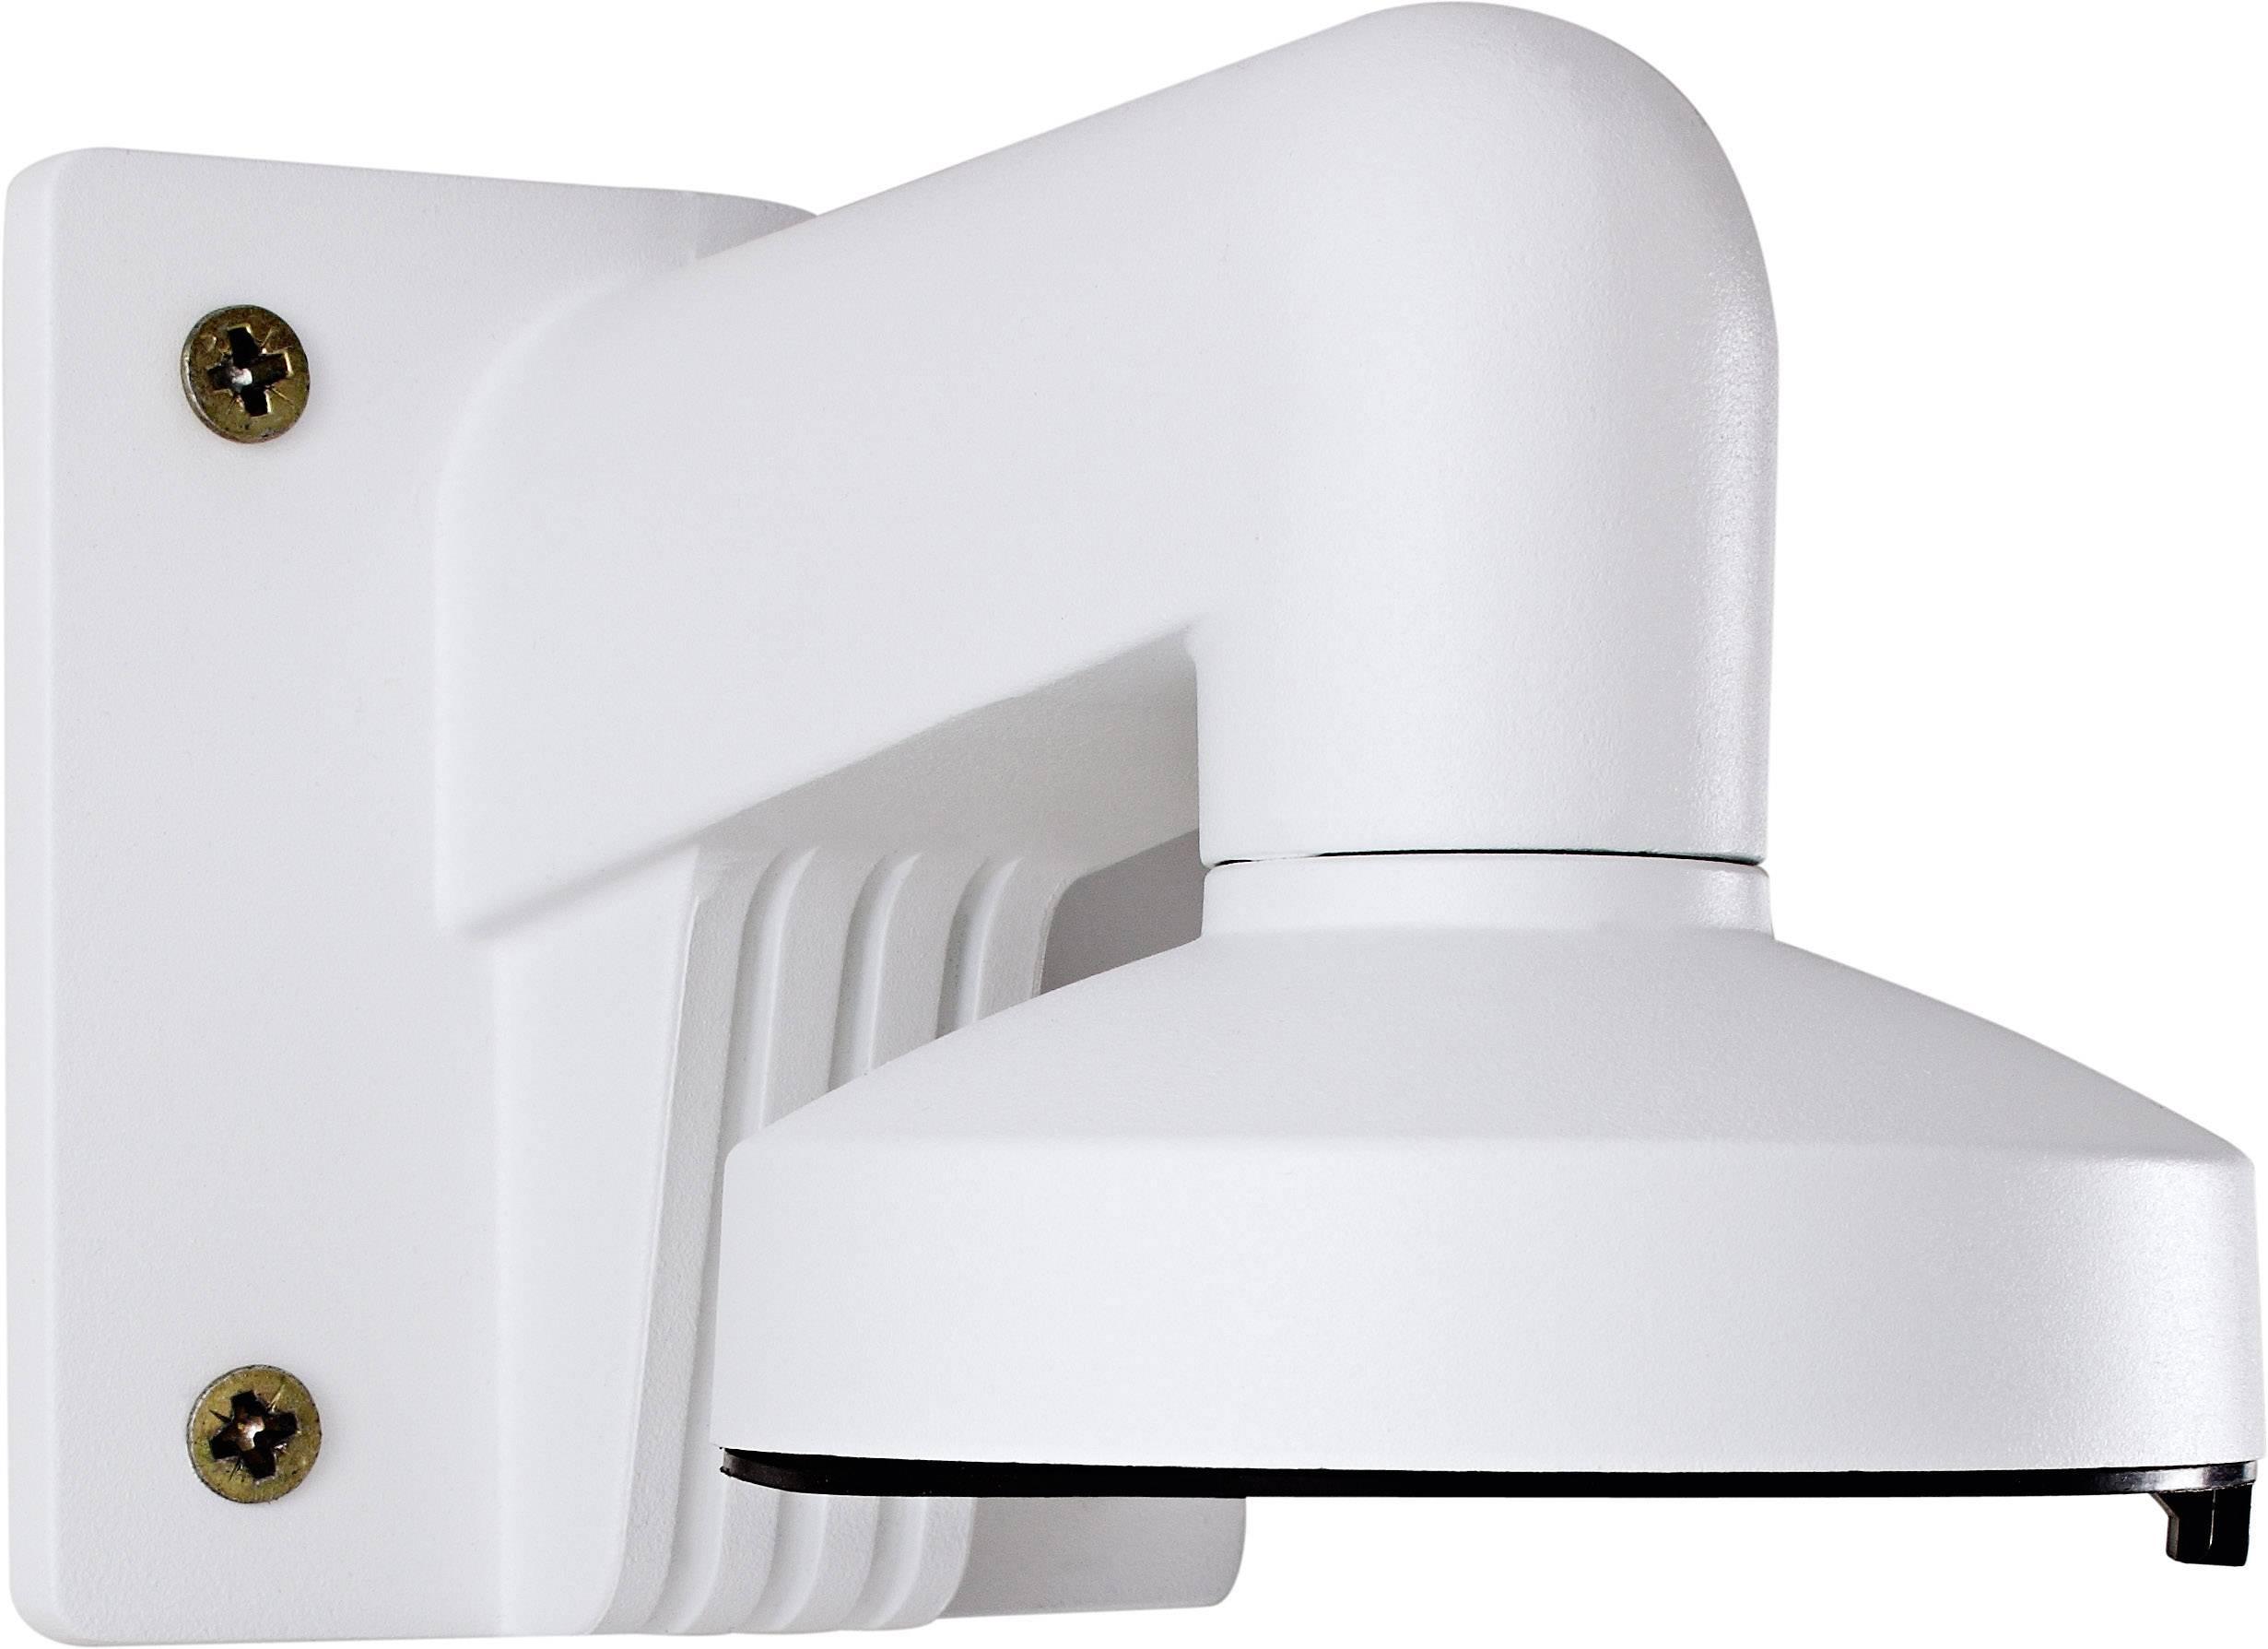 Nástěnný držák ABUS TVAC31500, bílá